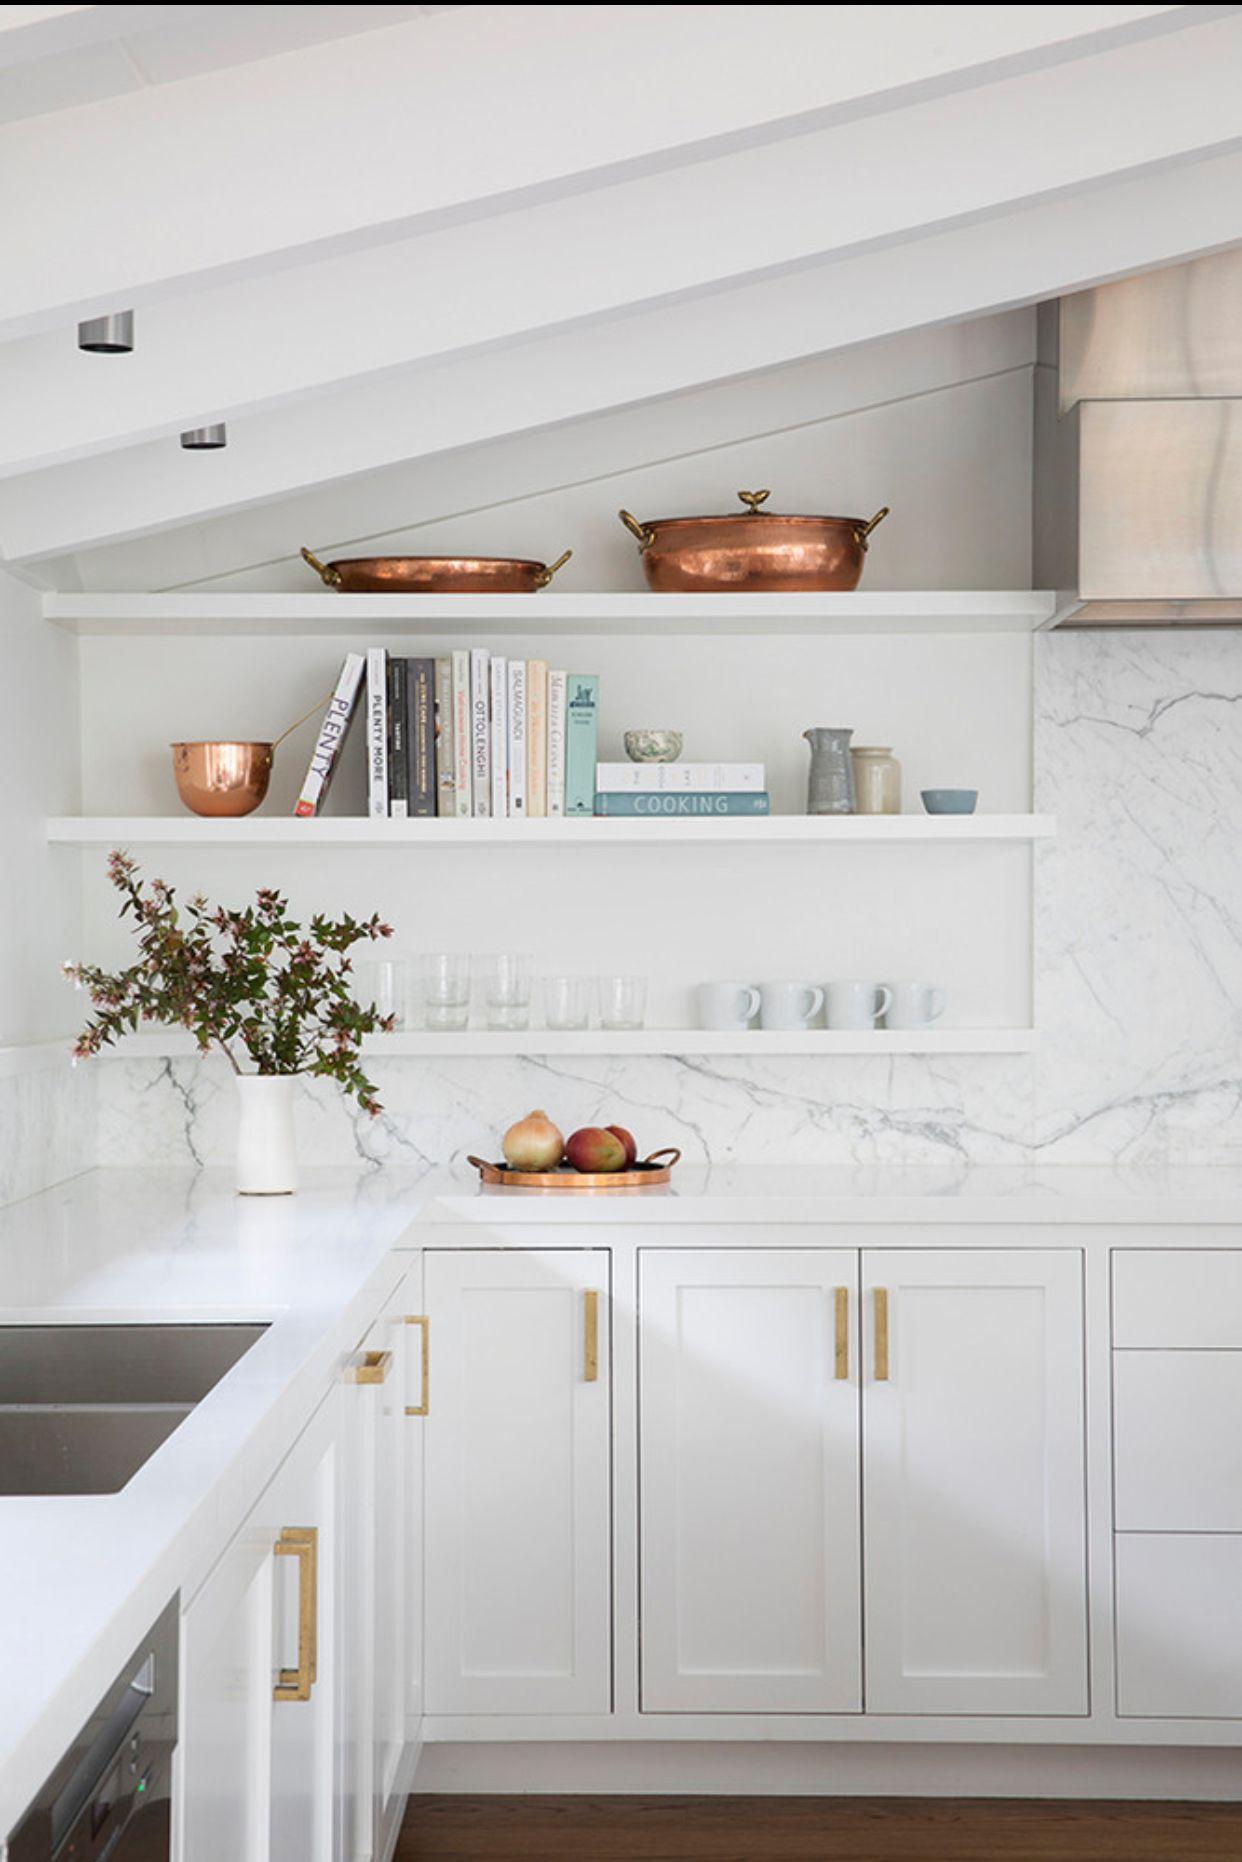 Kitchen Modern White And Gold Wall Shelves Floating Shelf